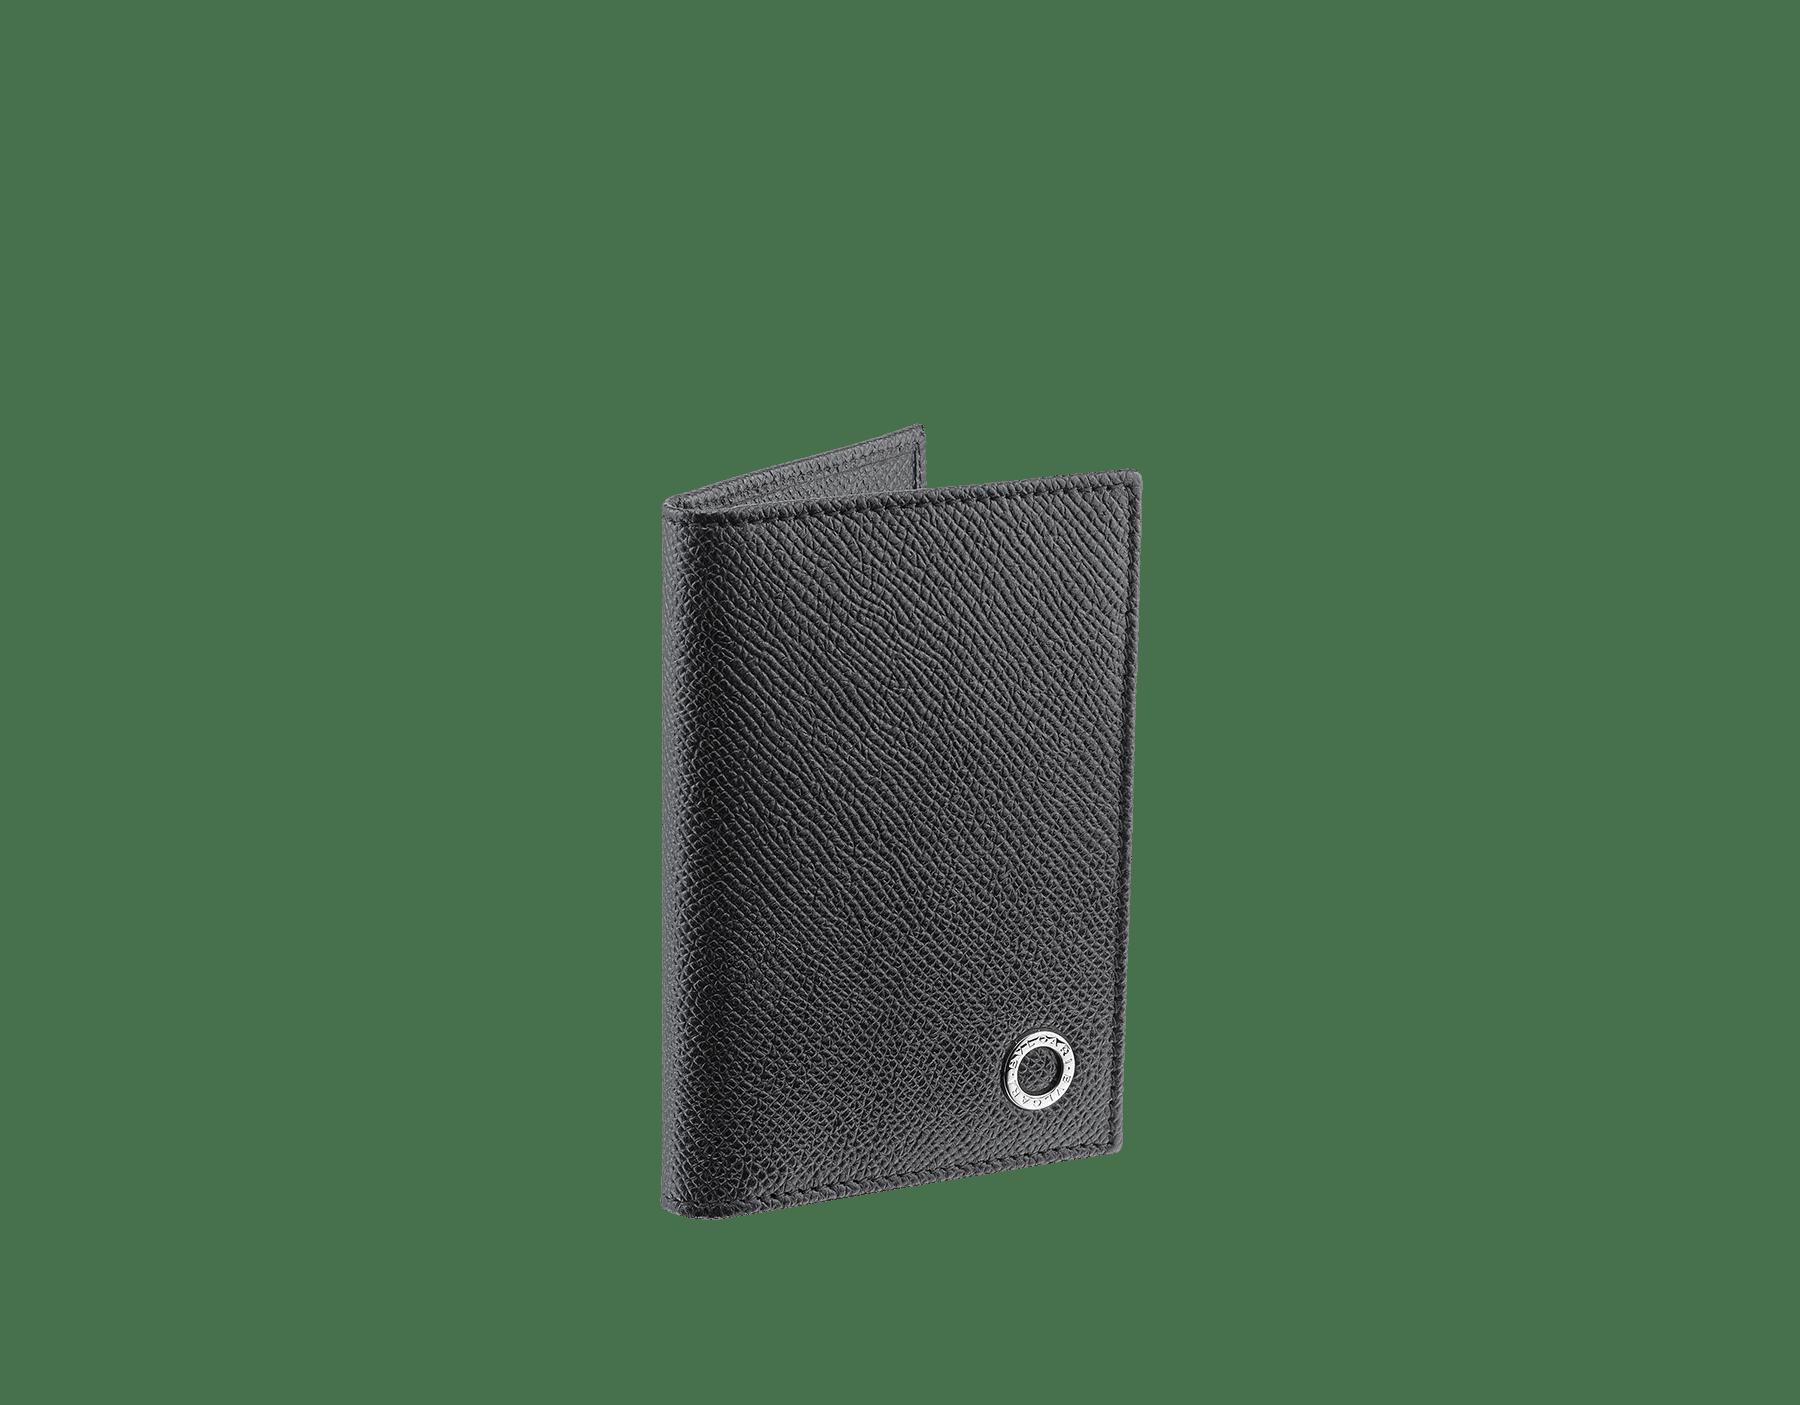 Folded credit card holder in black calf leather with brass palladium plated BVLGARI BVLGARI motif. 280292 image 1